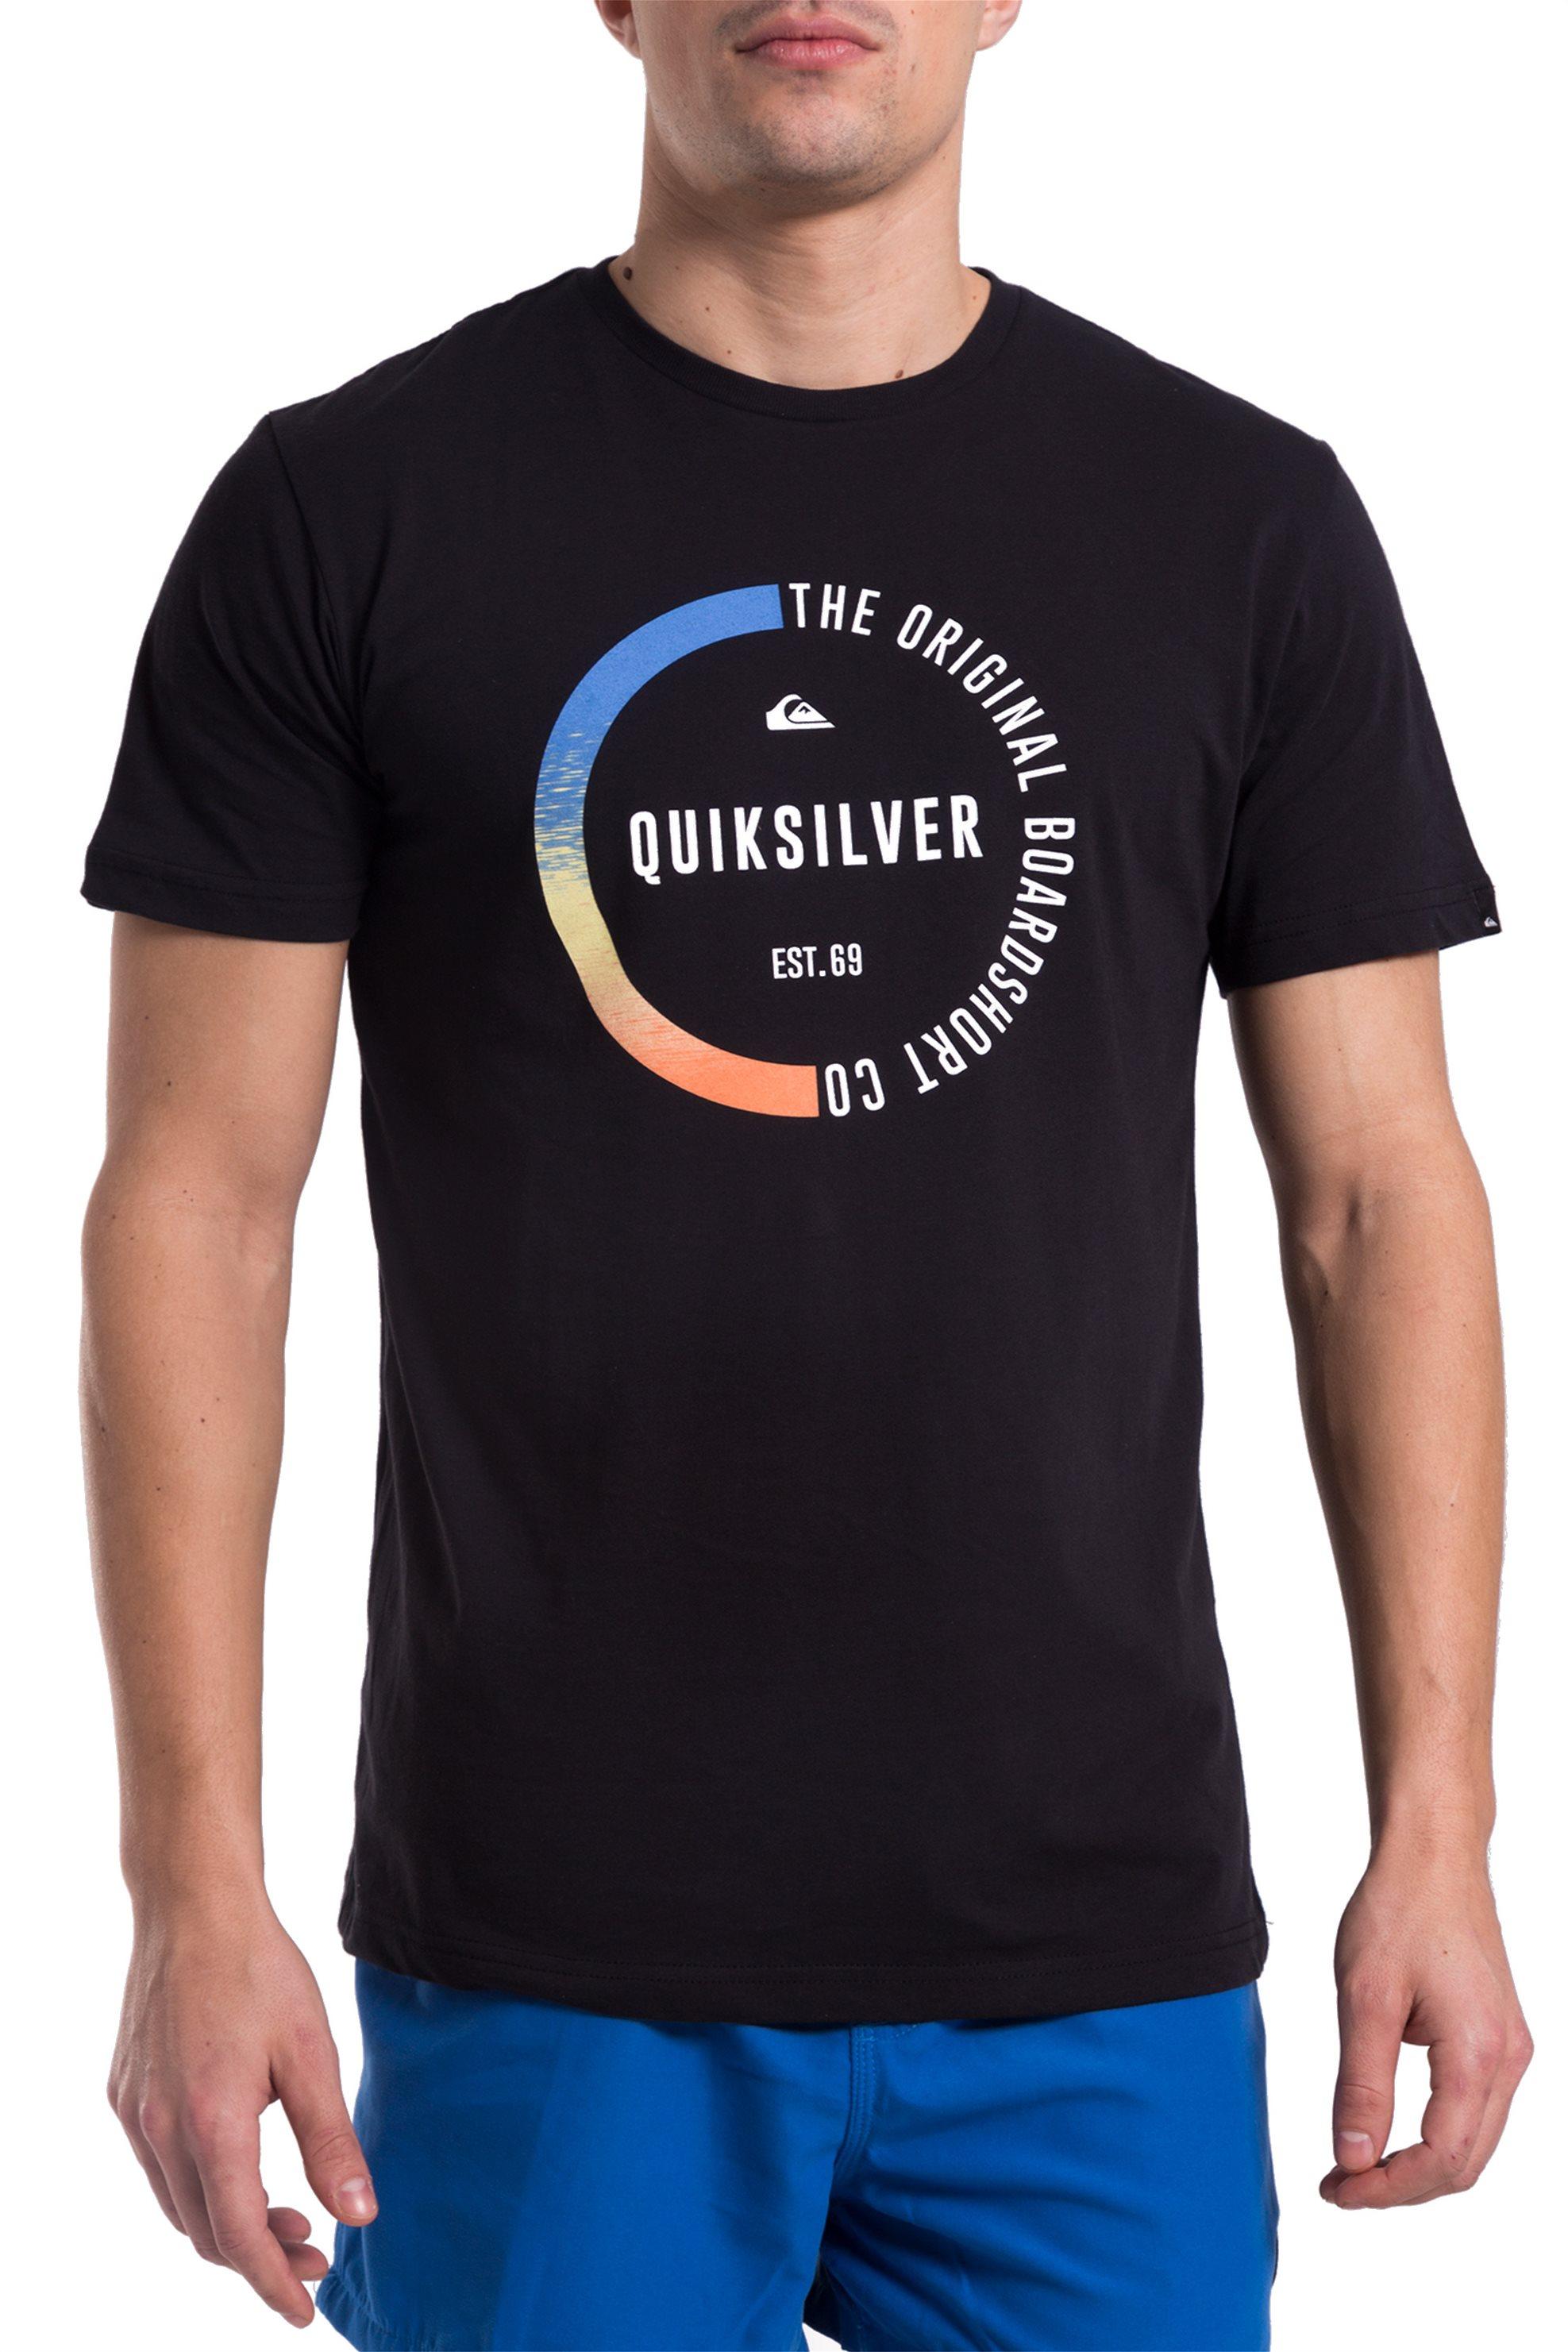 88ffe78aa79d Ανδρικά   Ρούχα   Μπλούζες-   Ανδρικό Μπλουζάκι MONKEY BIKE ...